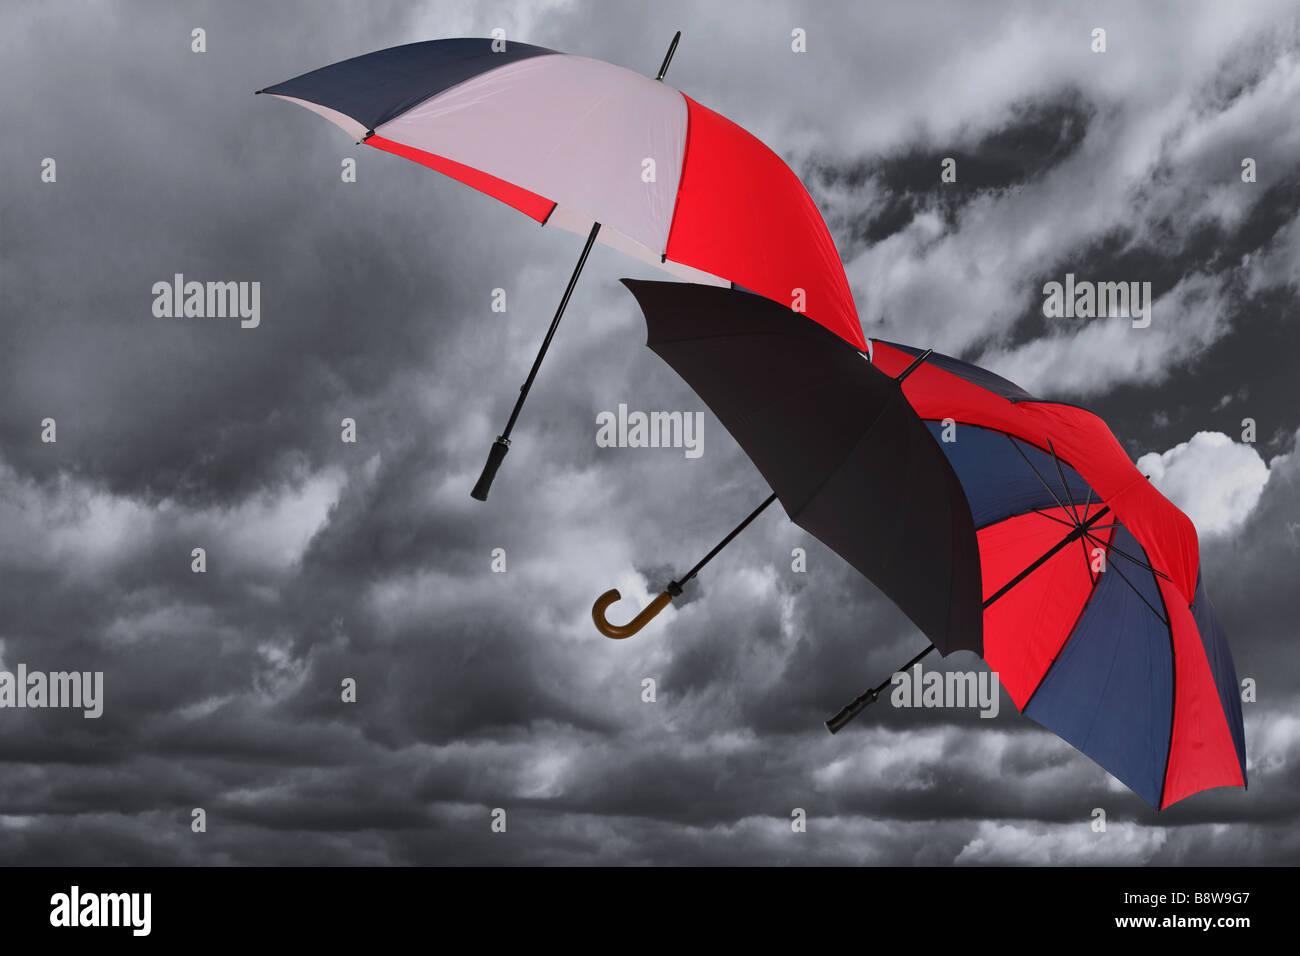 Drei Regenschirme über dunkle stürmische bewölktem Himmel geblasen Stockbild